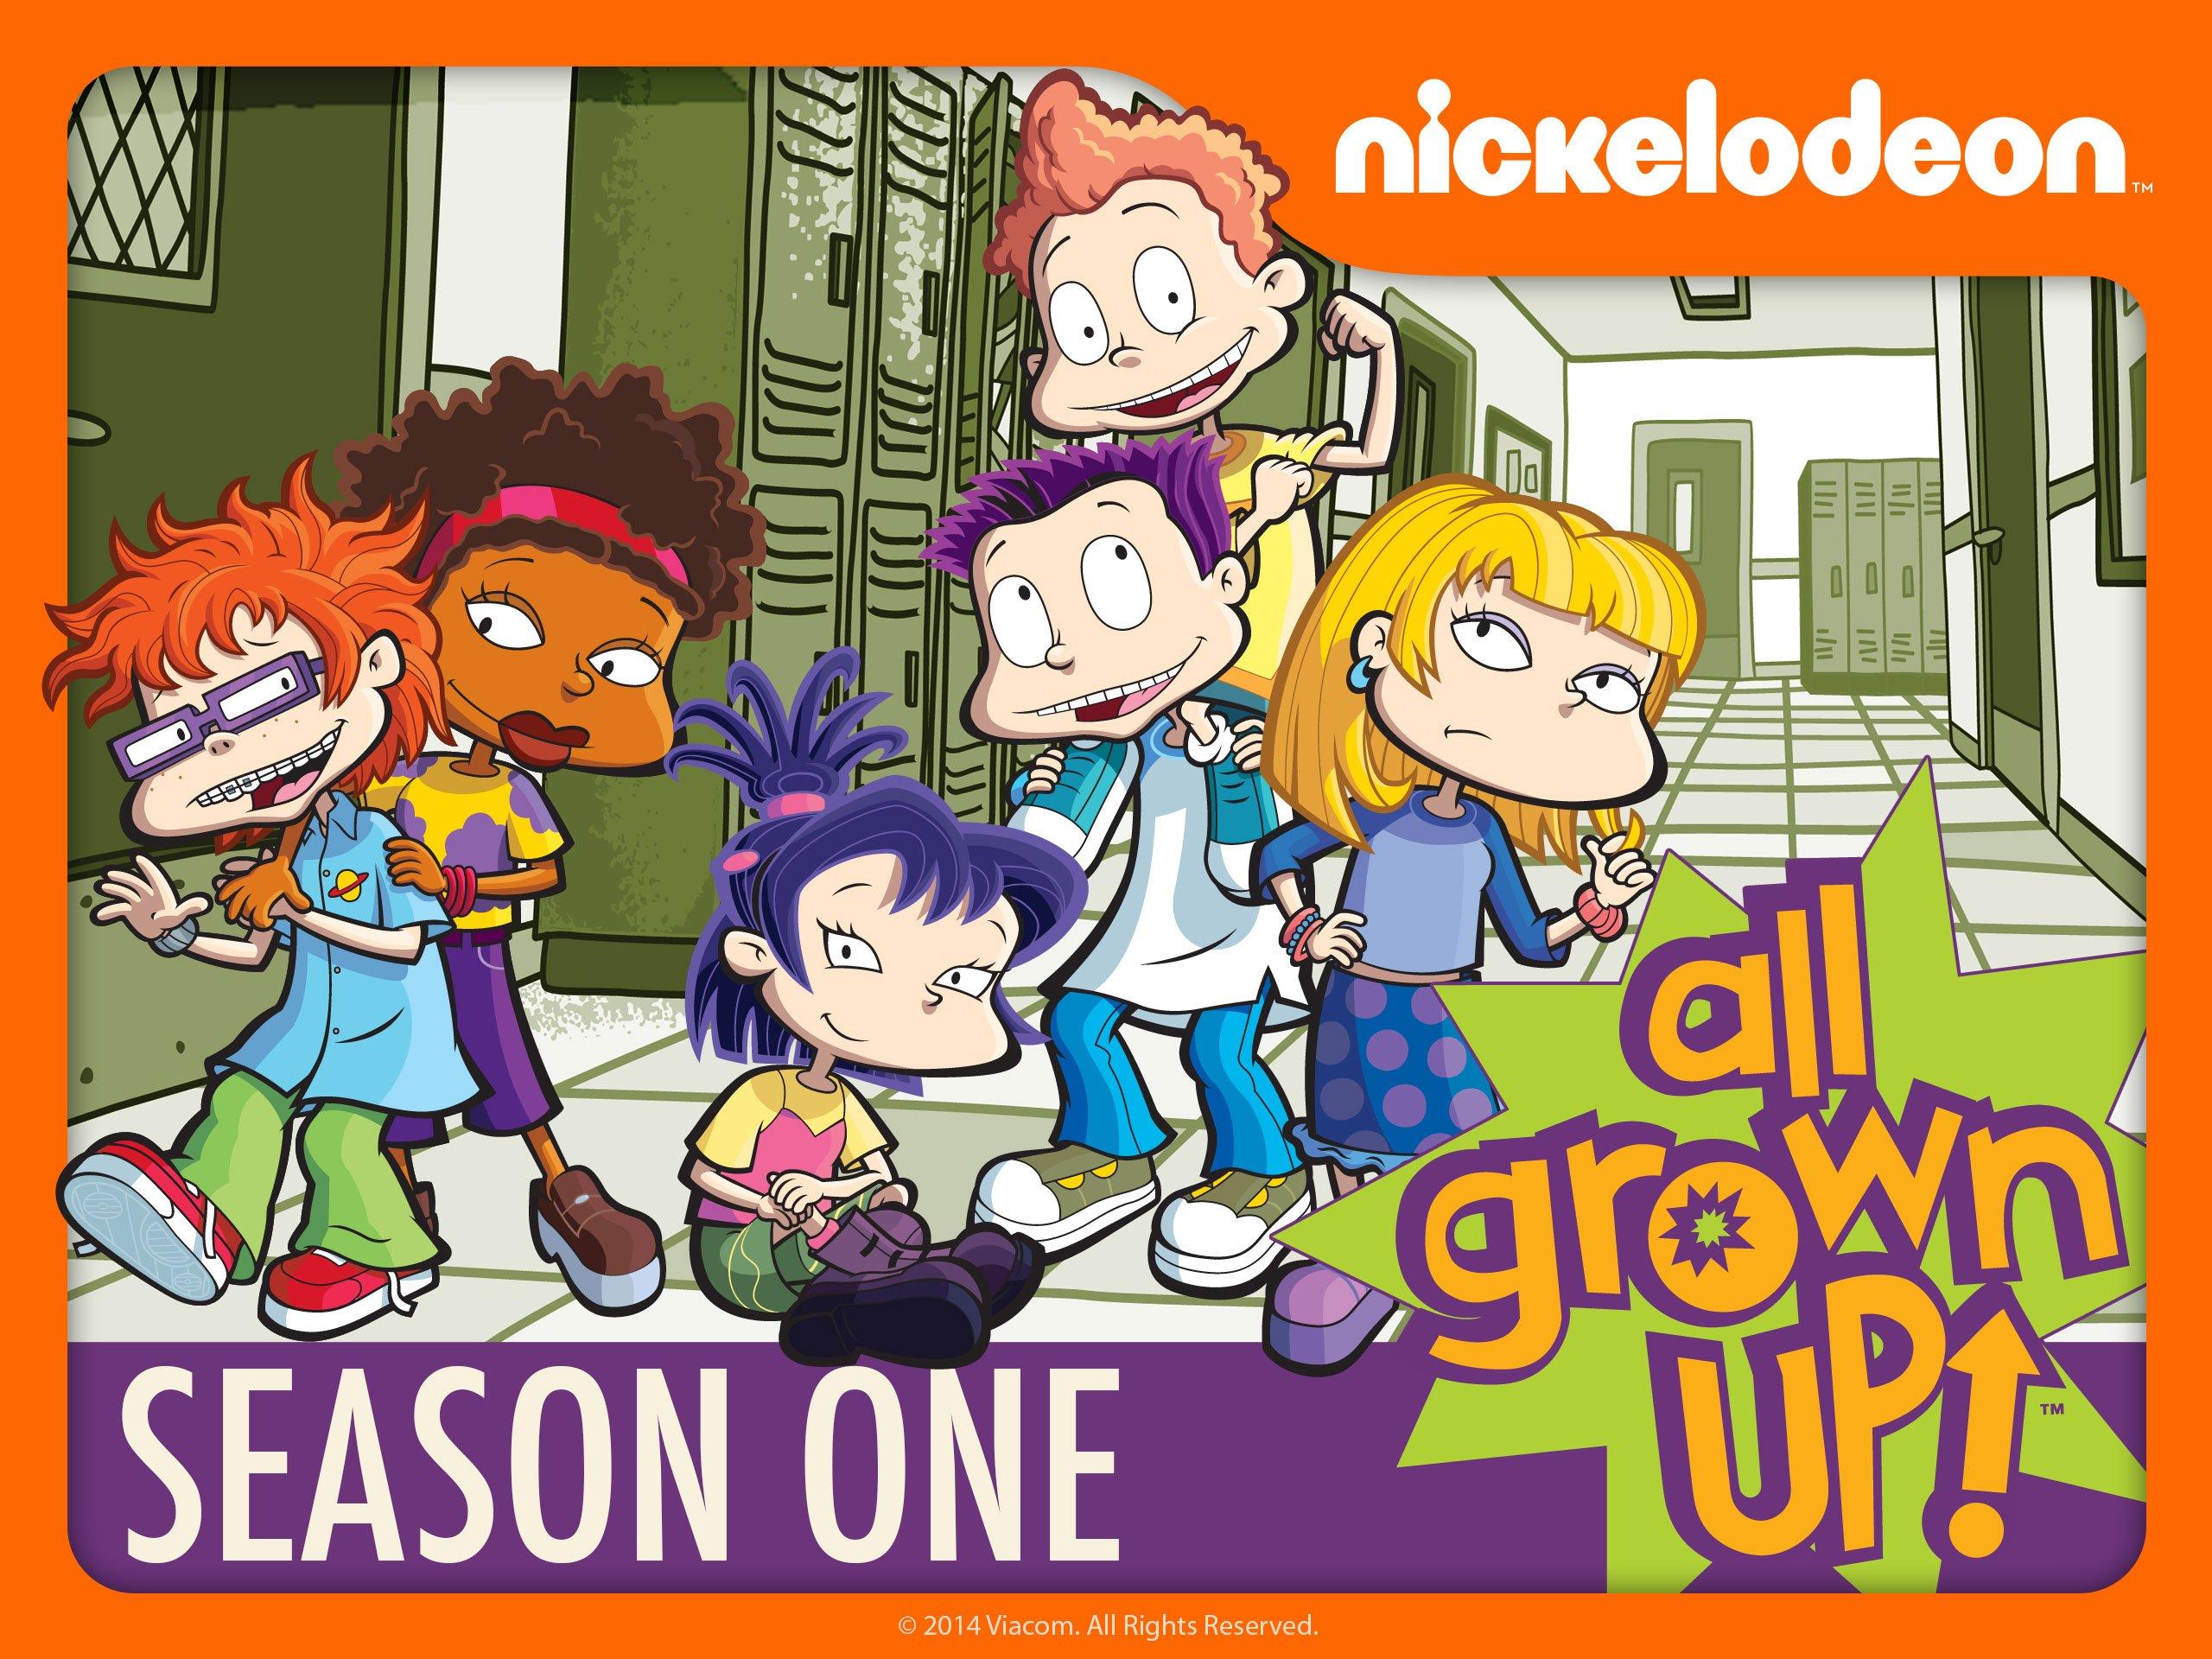 amazon com all grown up season 1 amazon digital services llc